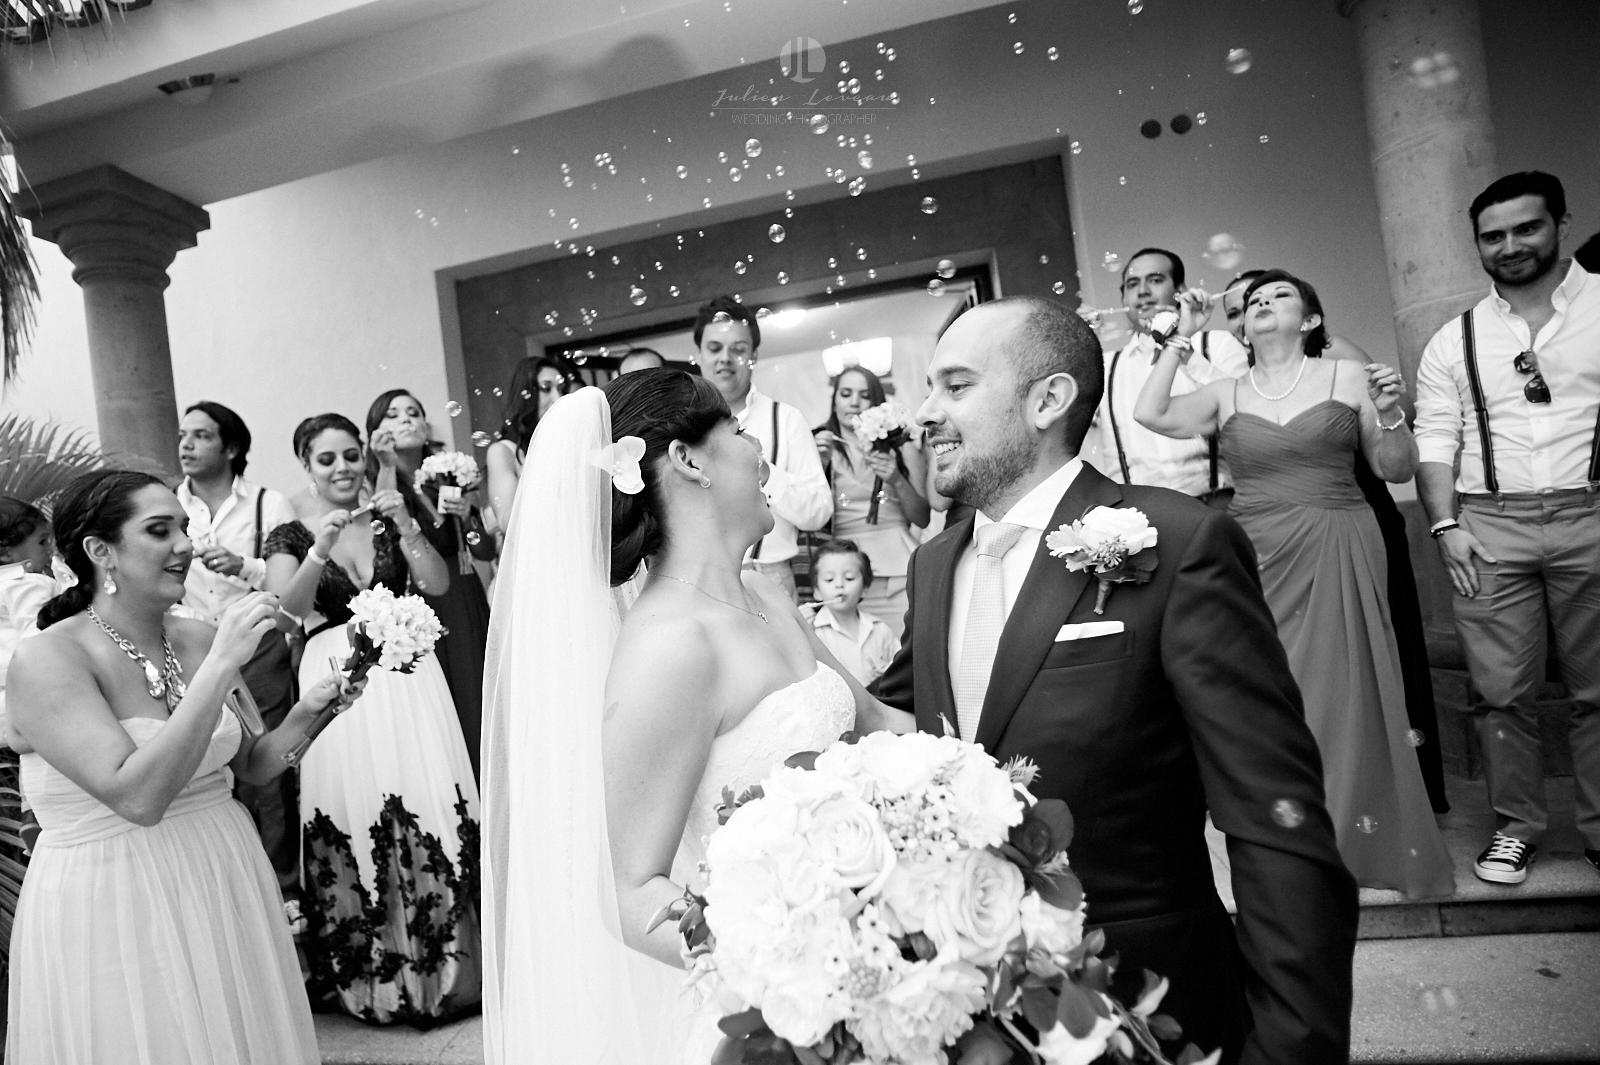 Wedding Photographer in Puerto Vallarta - Haapy couple leaves church